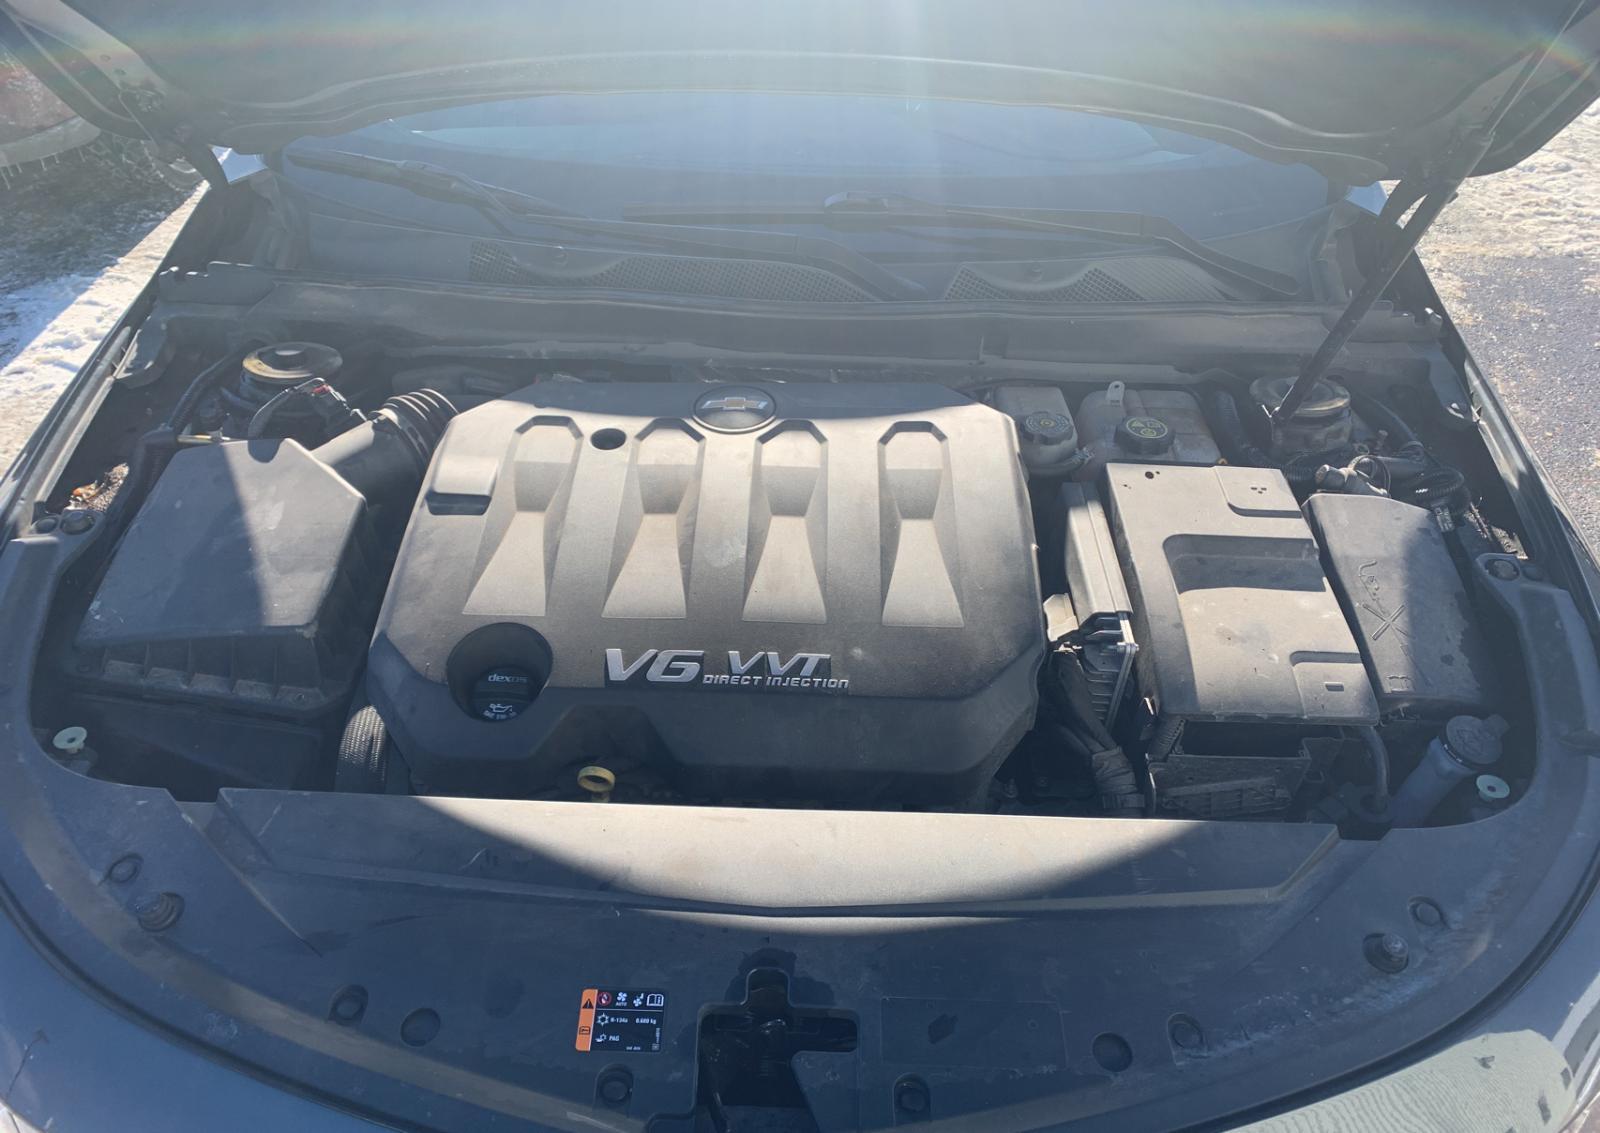 2G1125S37F9185464 - 2015 Chevrolet Impala Lt 3.6L inside view